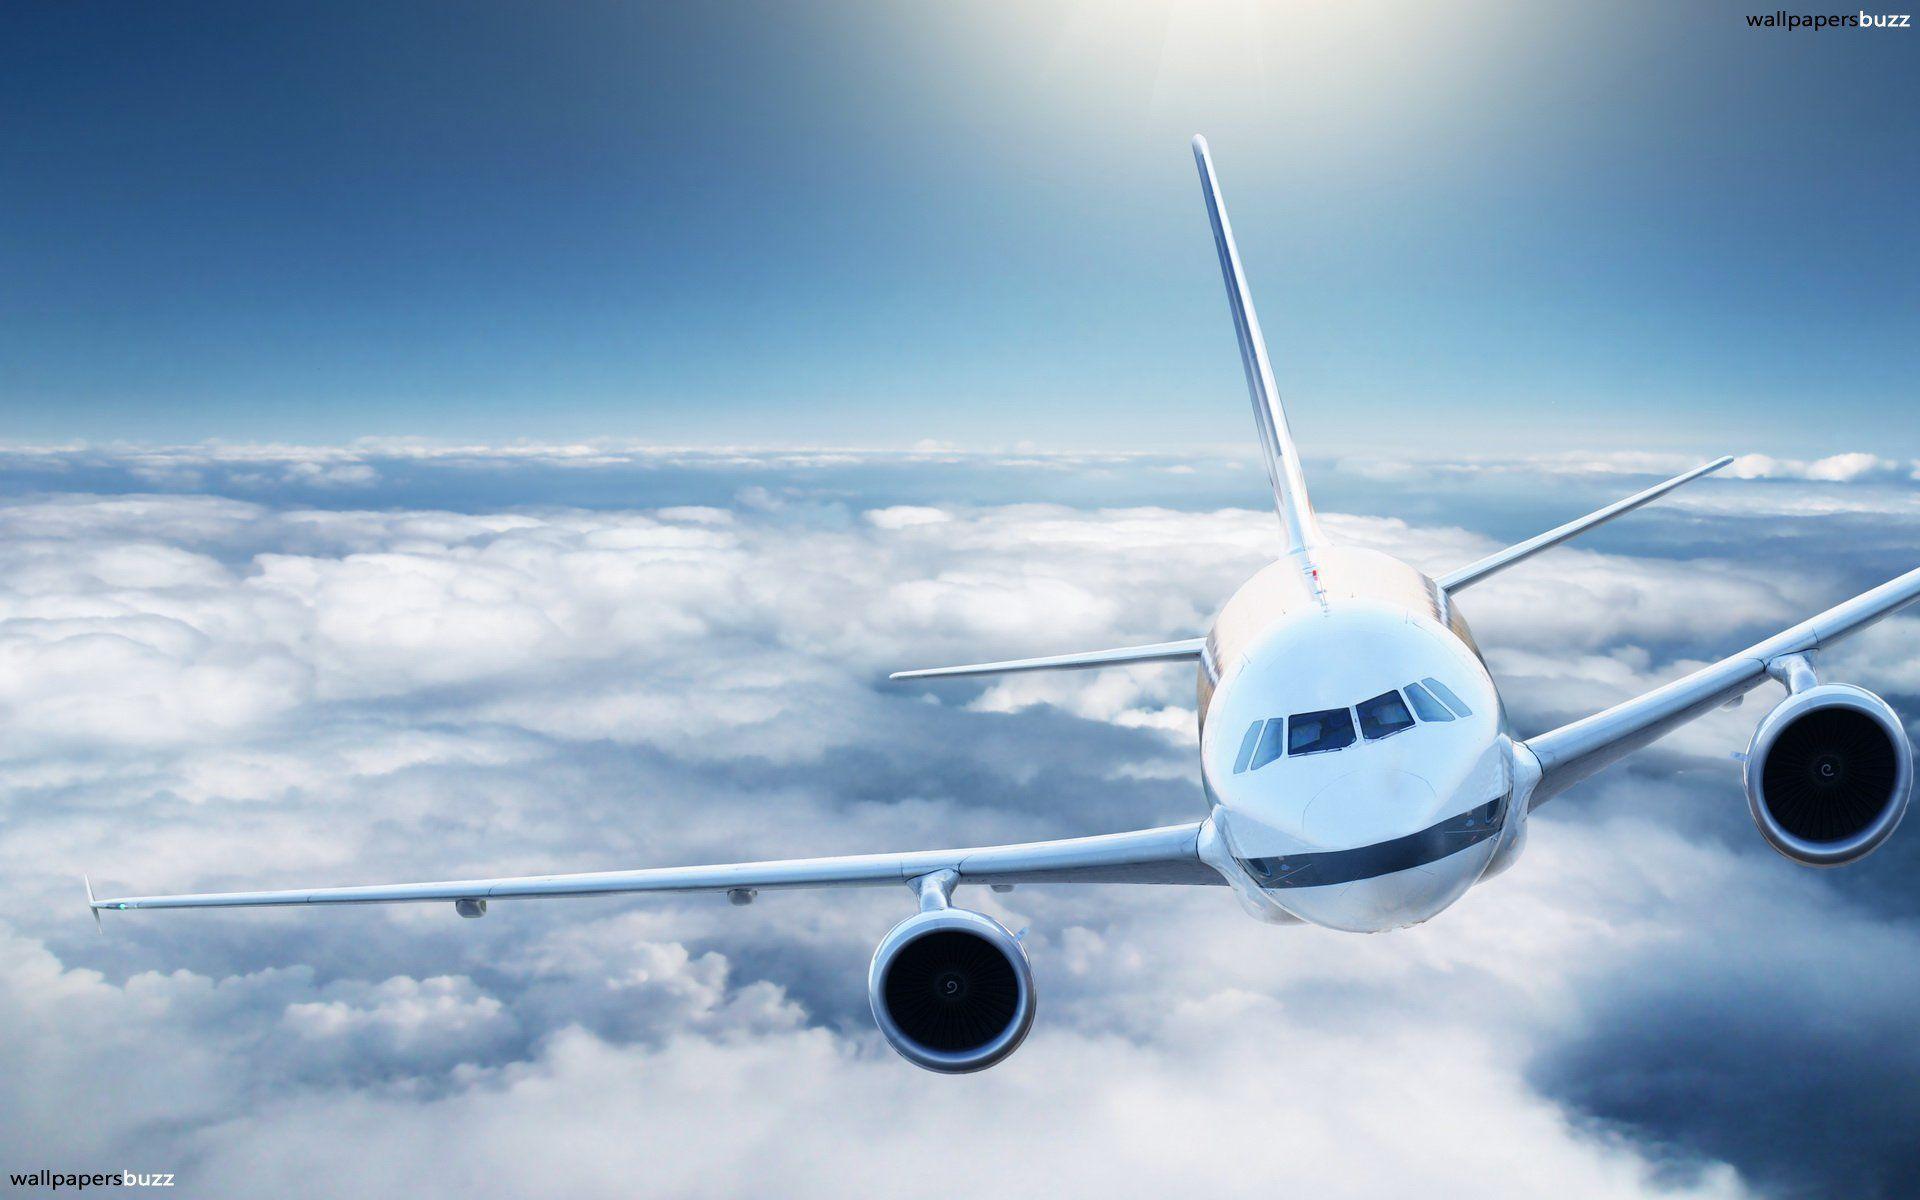 Aeroplane Wallpapers - Top Free